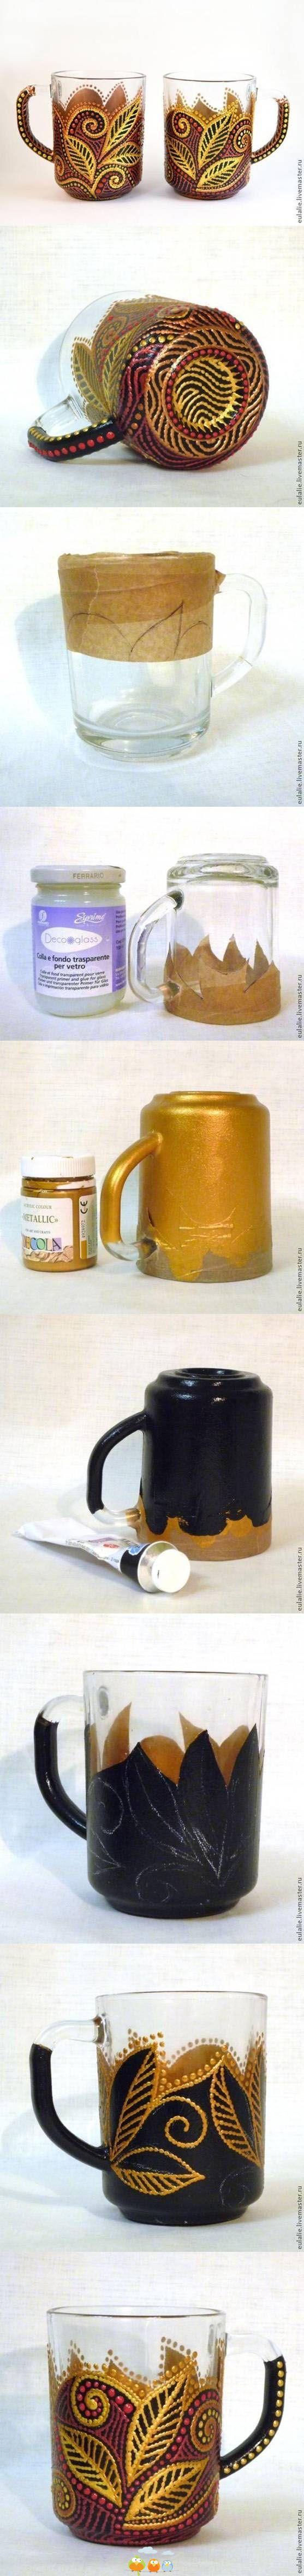 http://www.promosmall.com/Drinkware/ - Get Custom Promotional Drinkware -